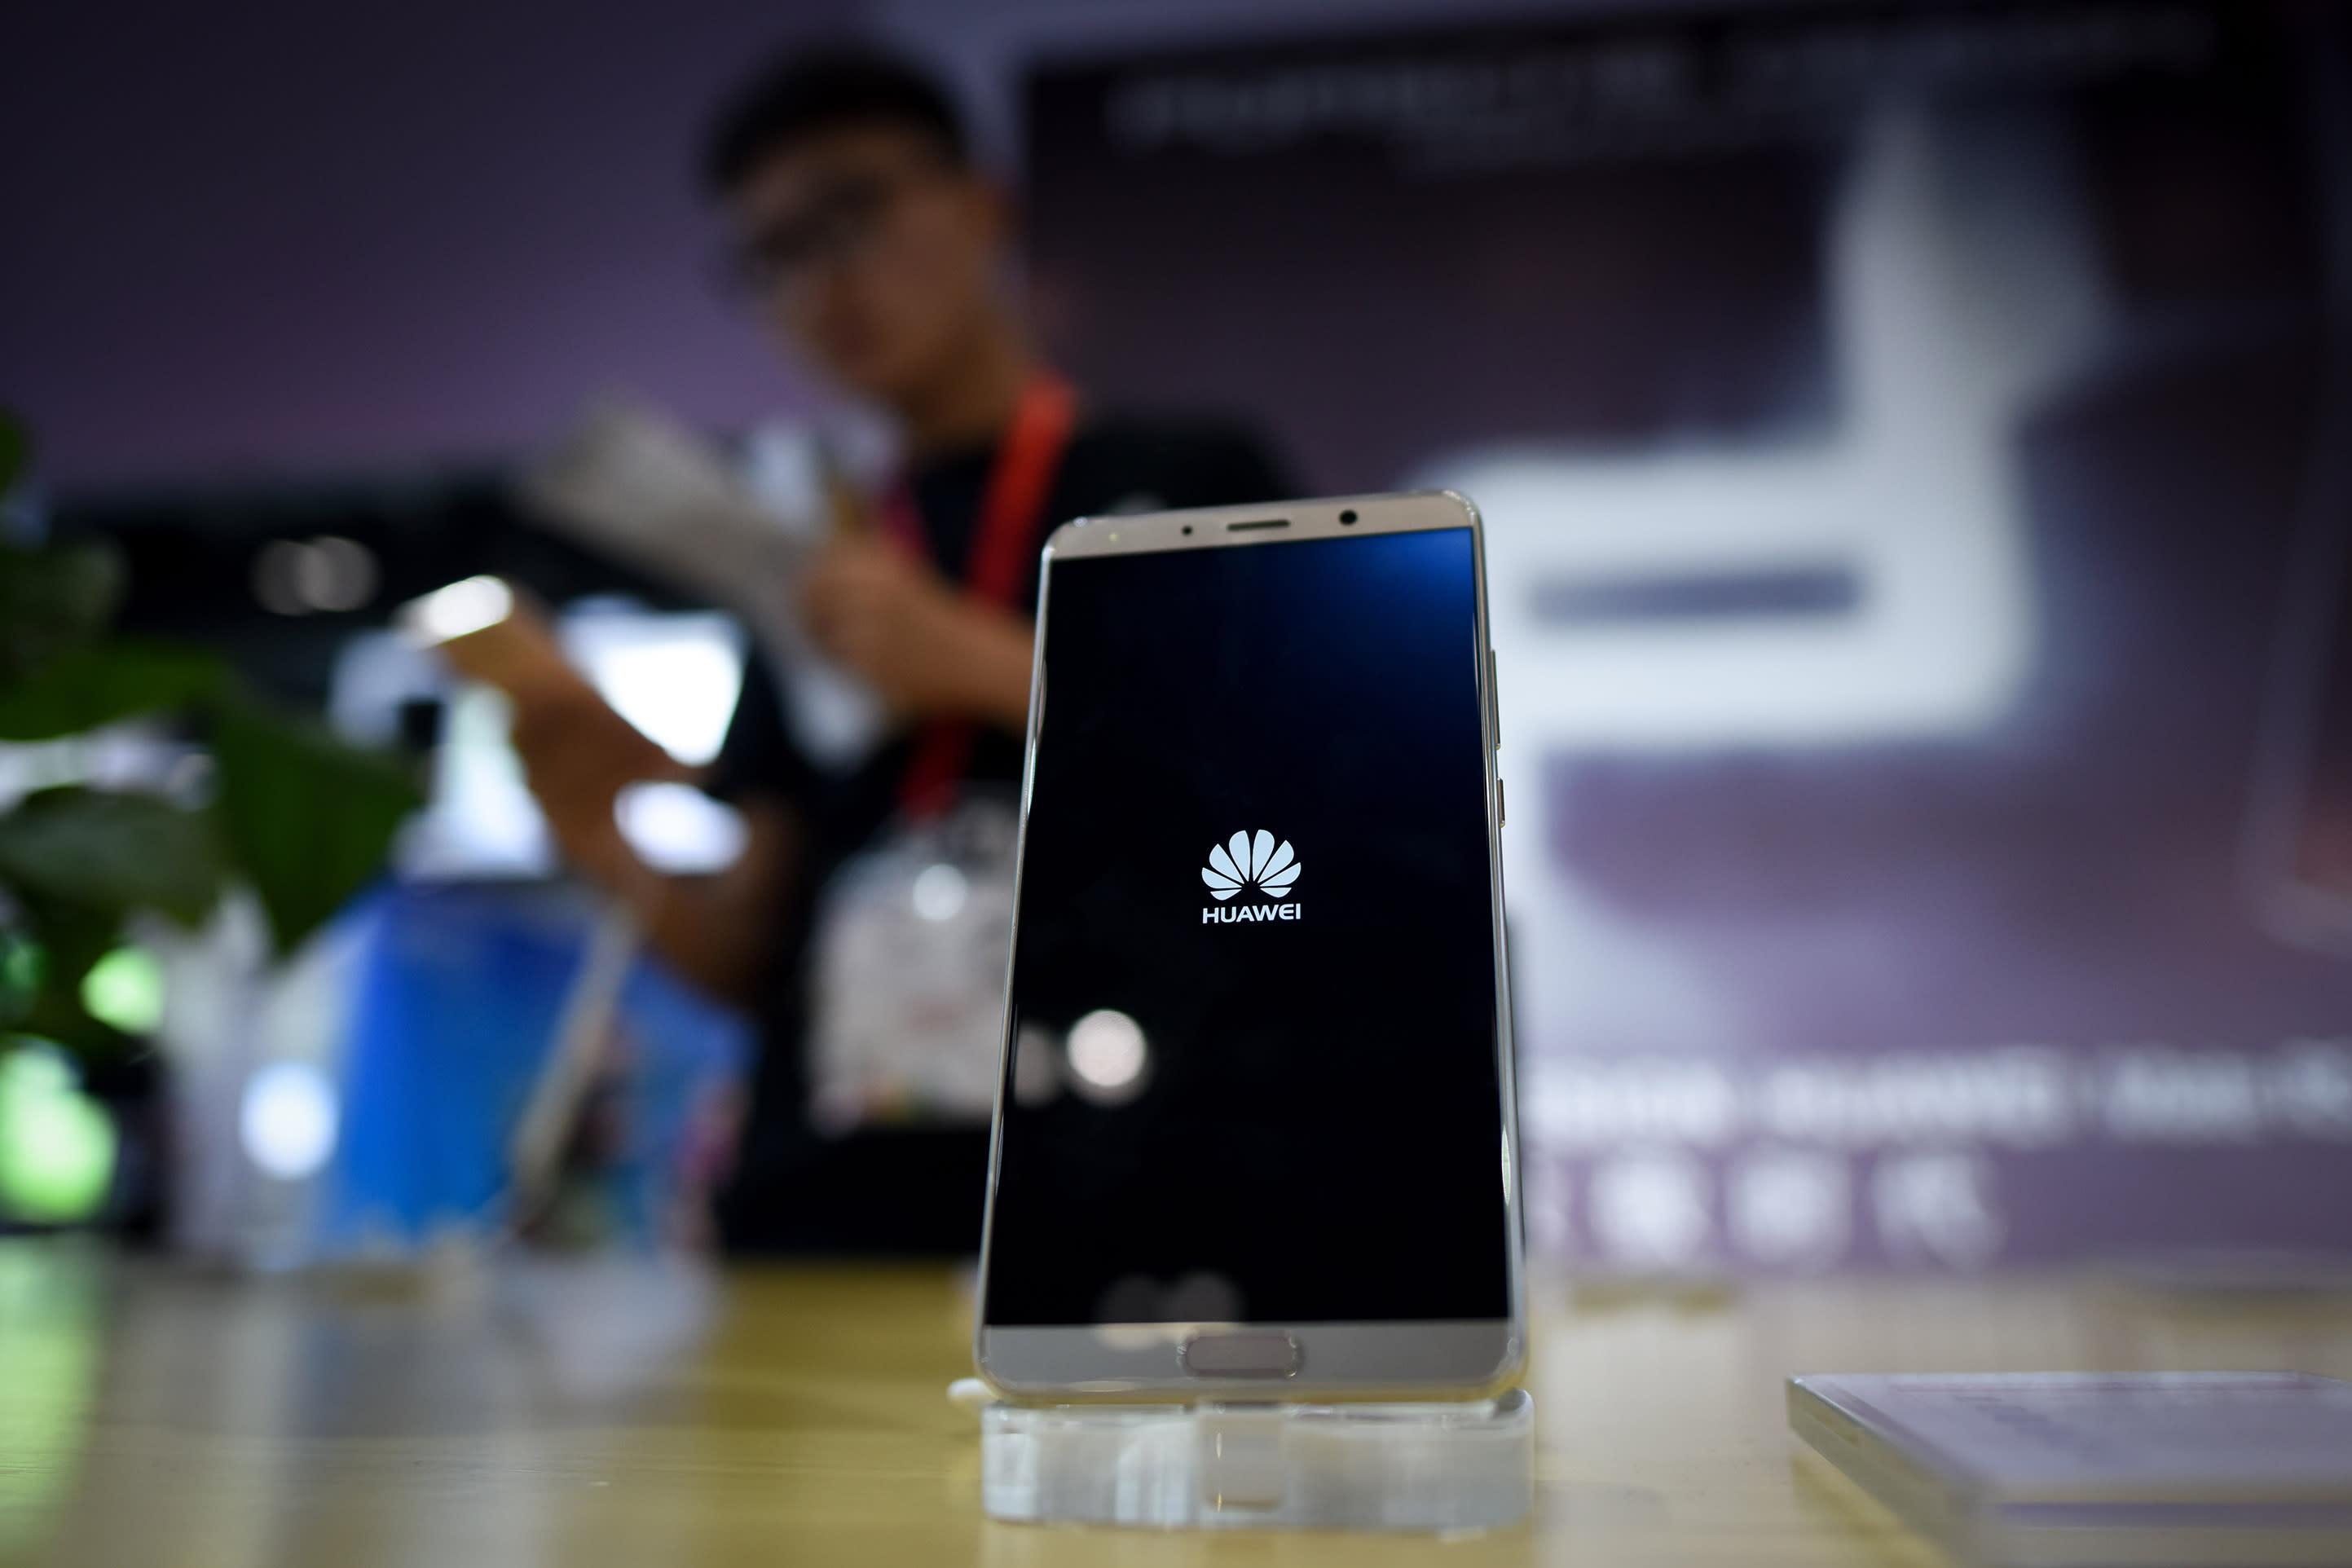 Japanese, UK carriers delay release of Huawei phones